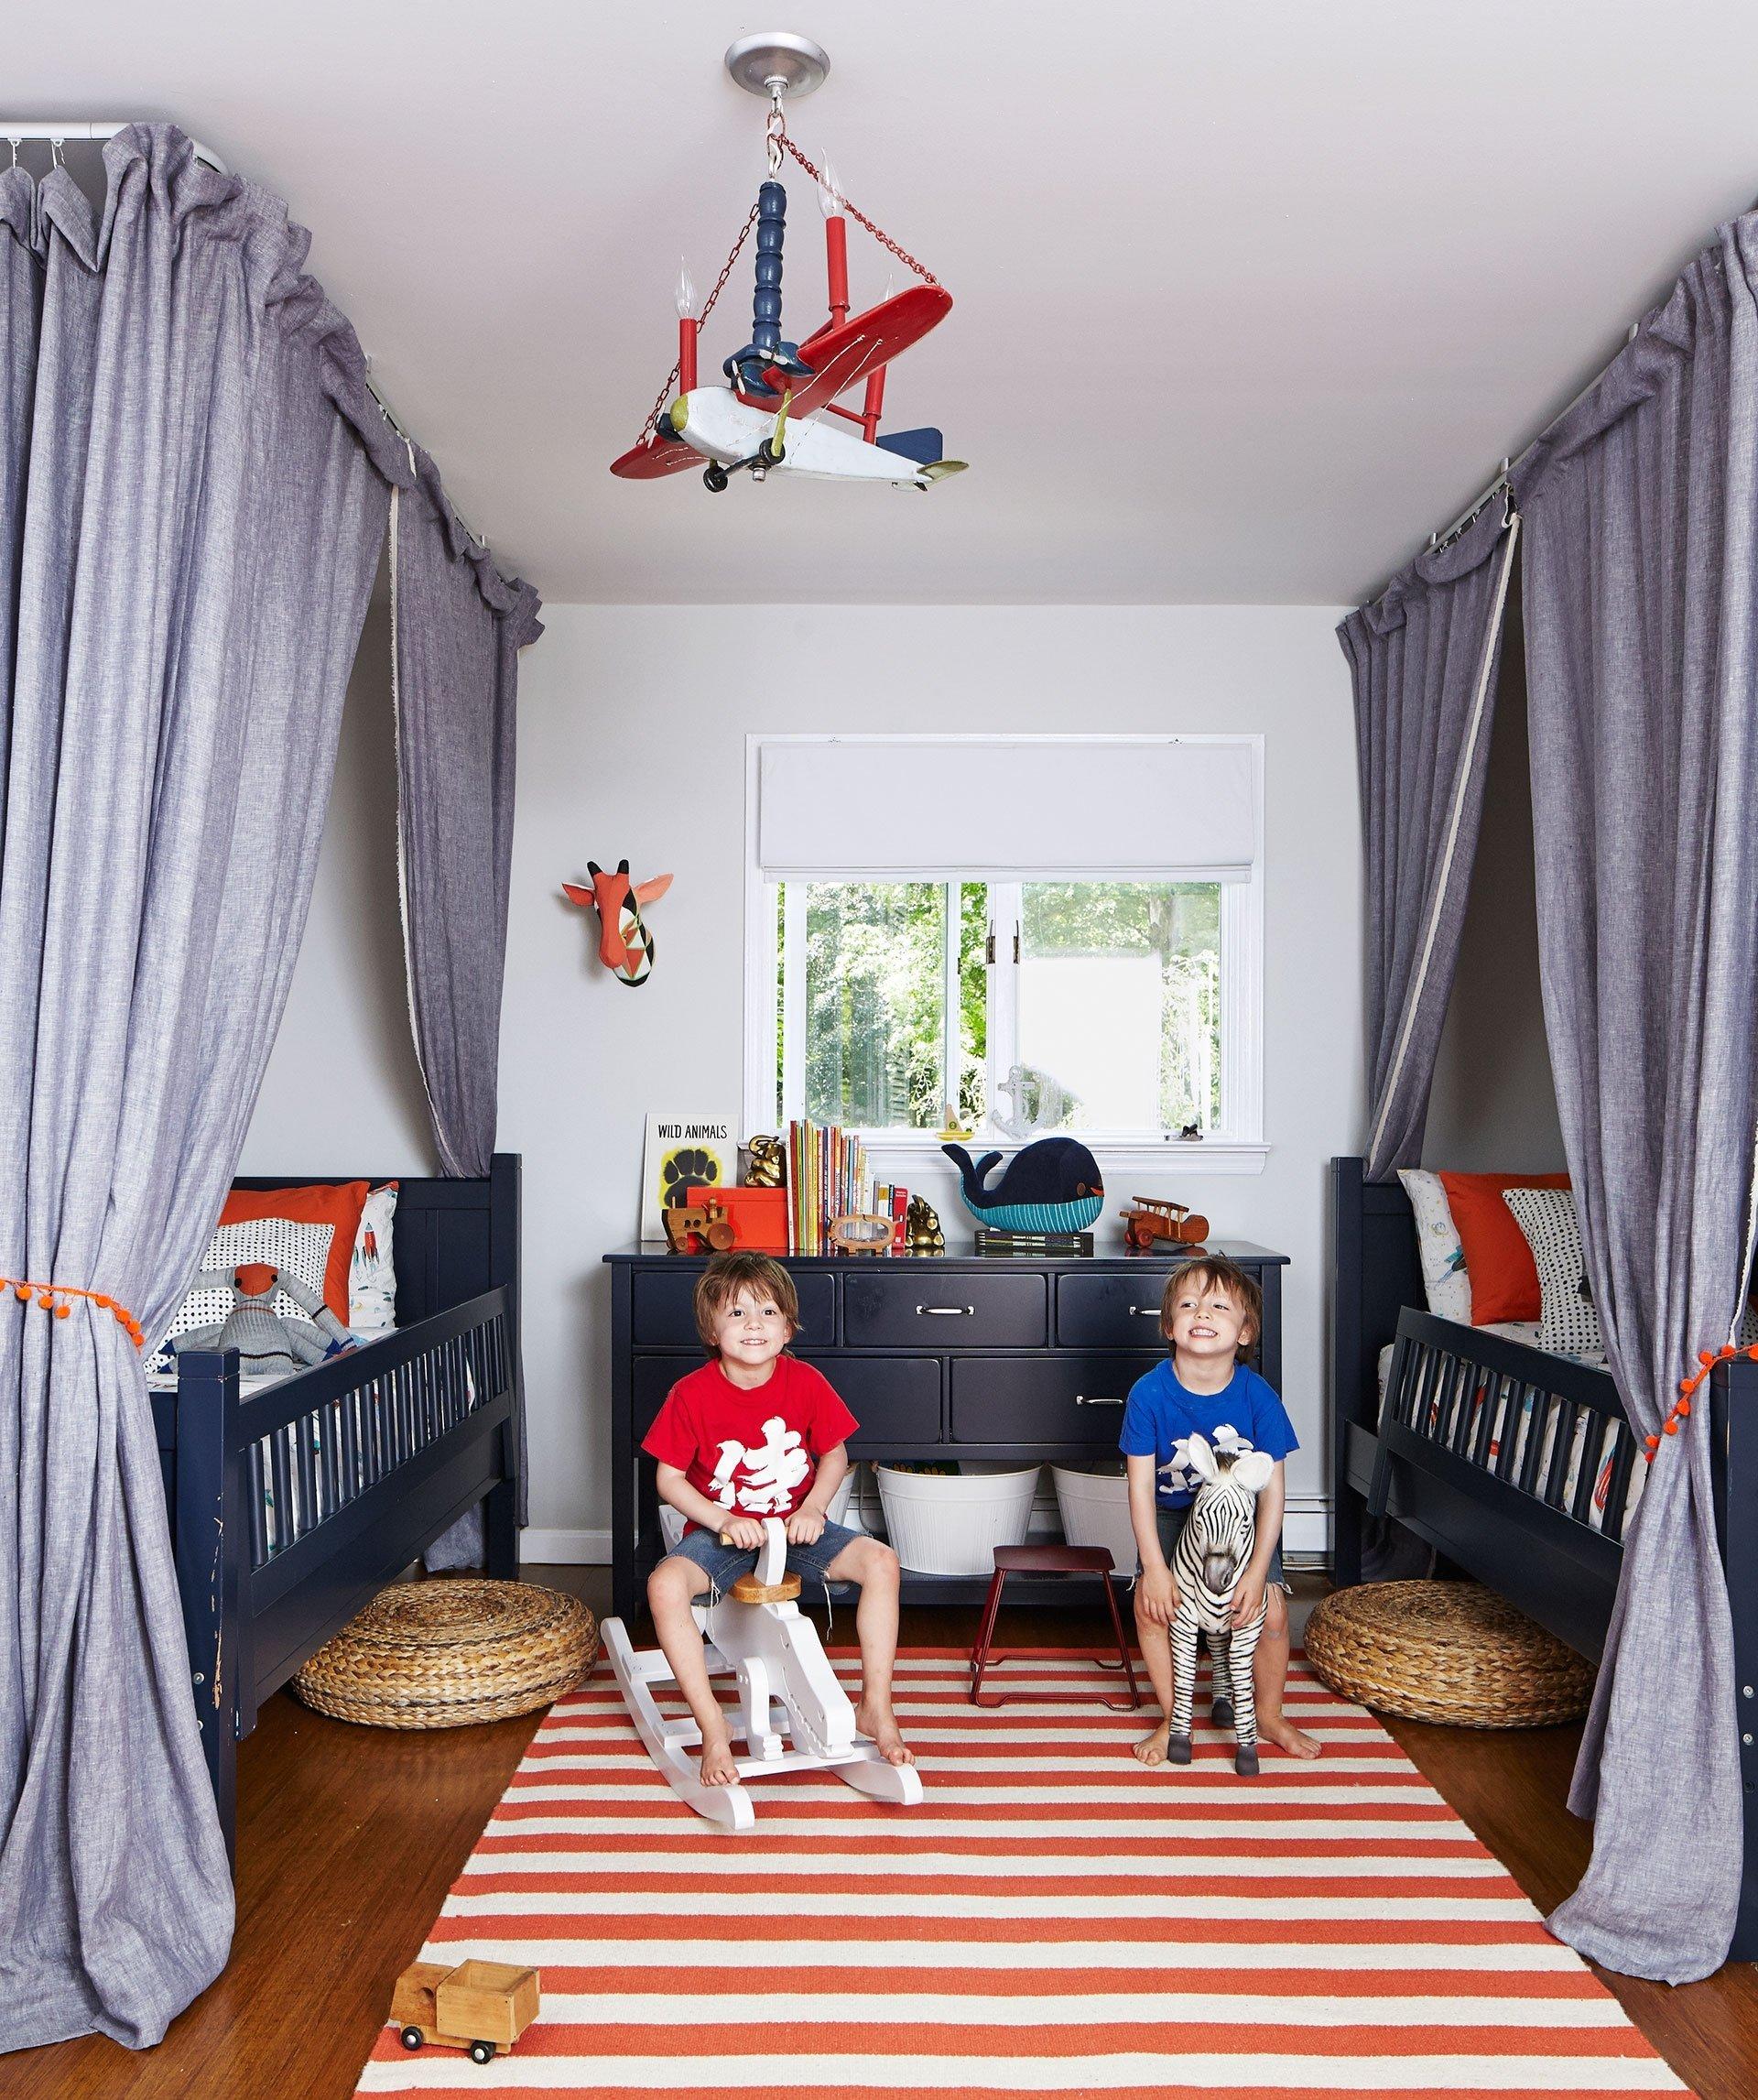 10 Most Popular Ideas For A Boys Room boy bedroom decor ideas awesome big boy room decorating ideas mature 2020